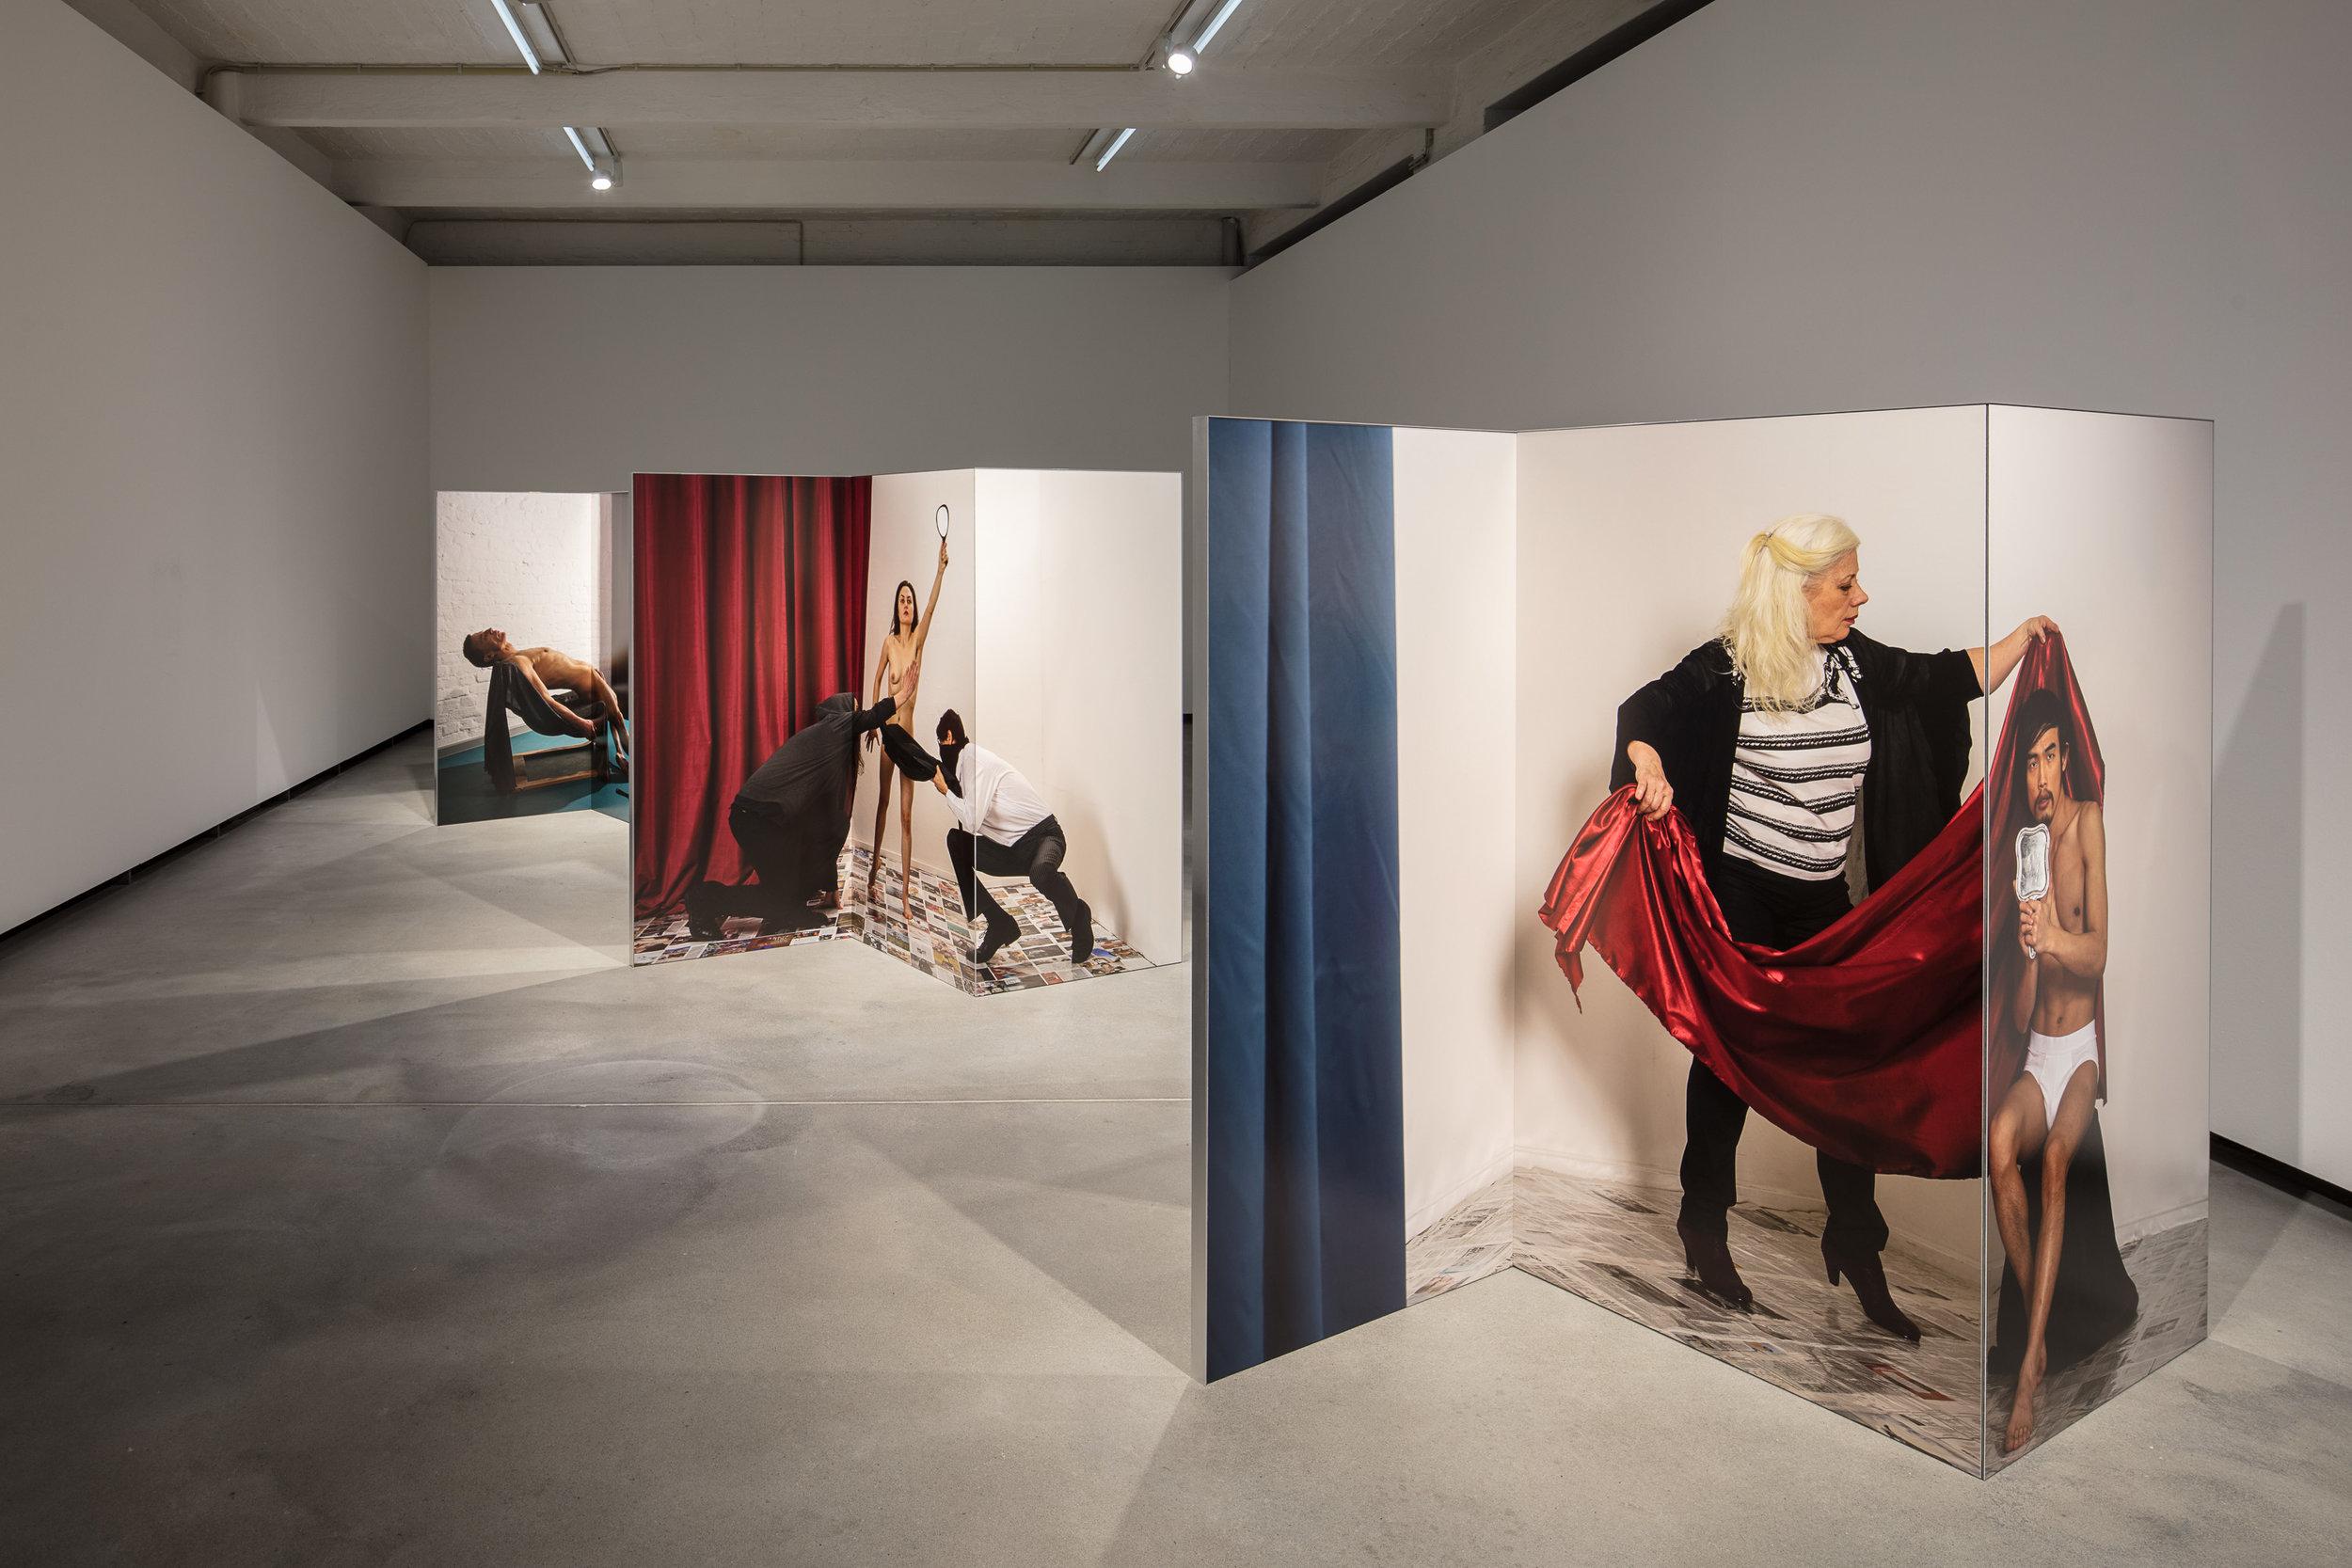 1.Changing Room, Installation view Künsterlhaus Bethanien, archival pigment print on AluDibond, mirror, aluminium, 2017